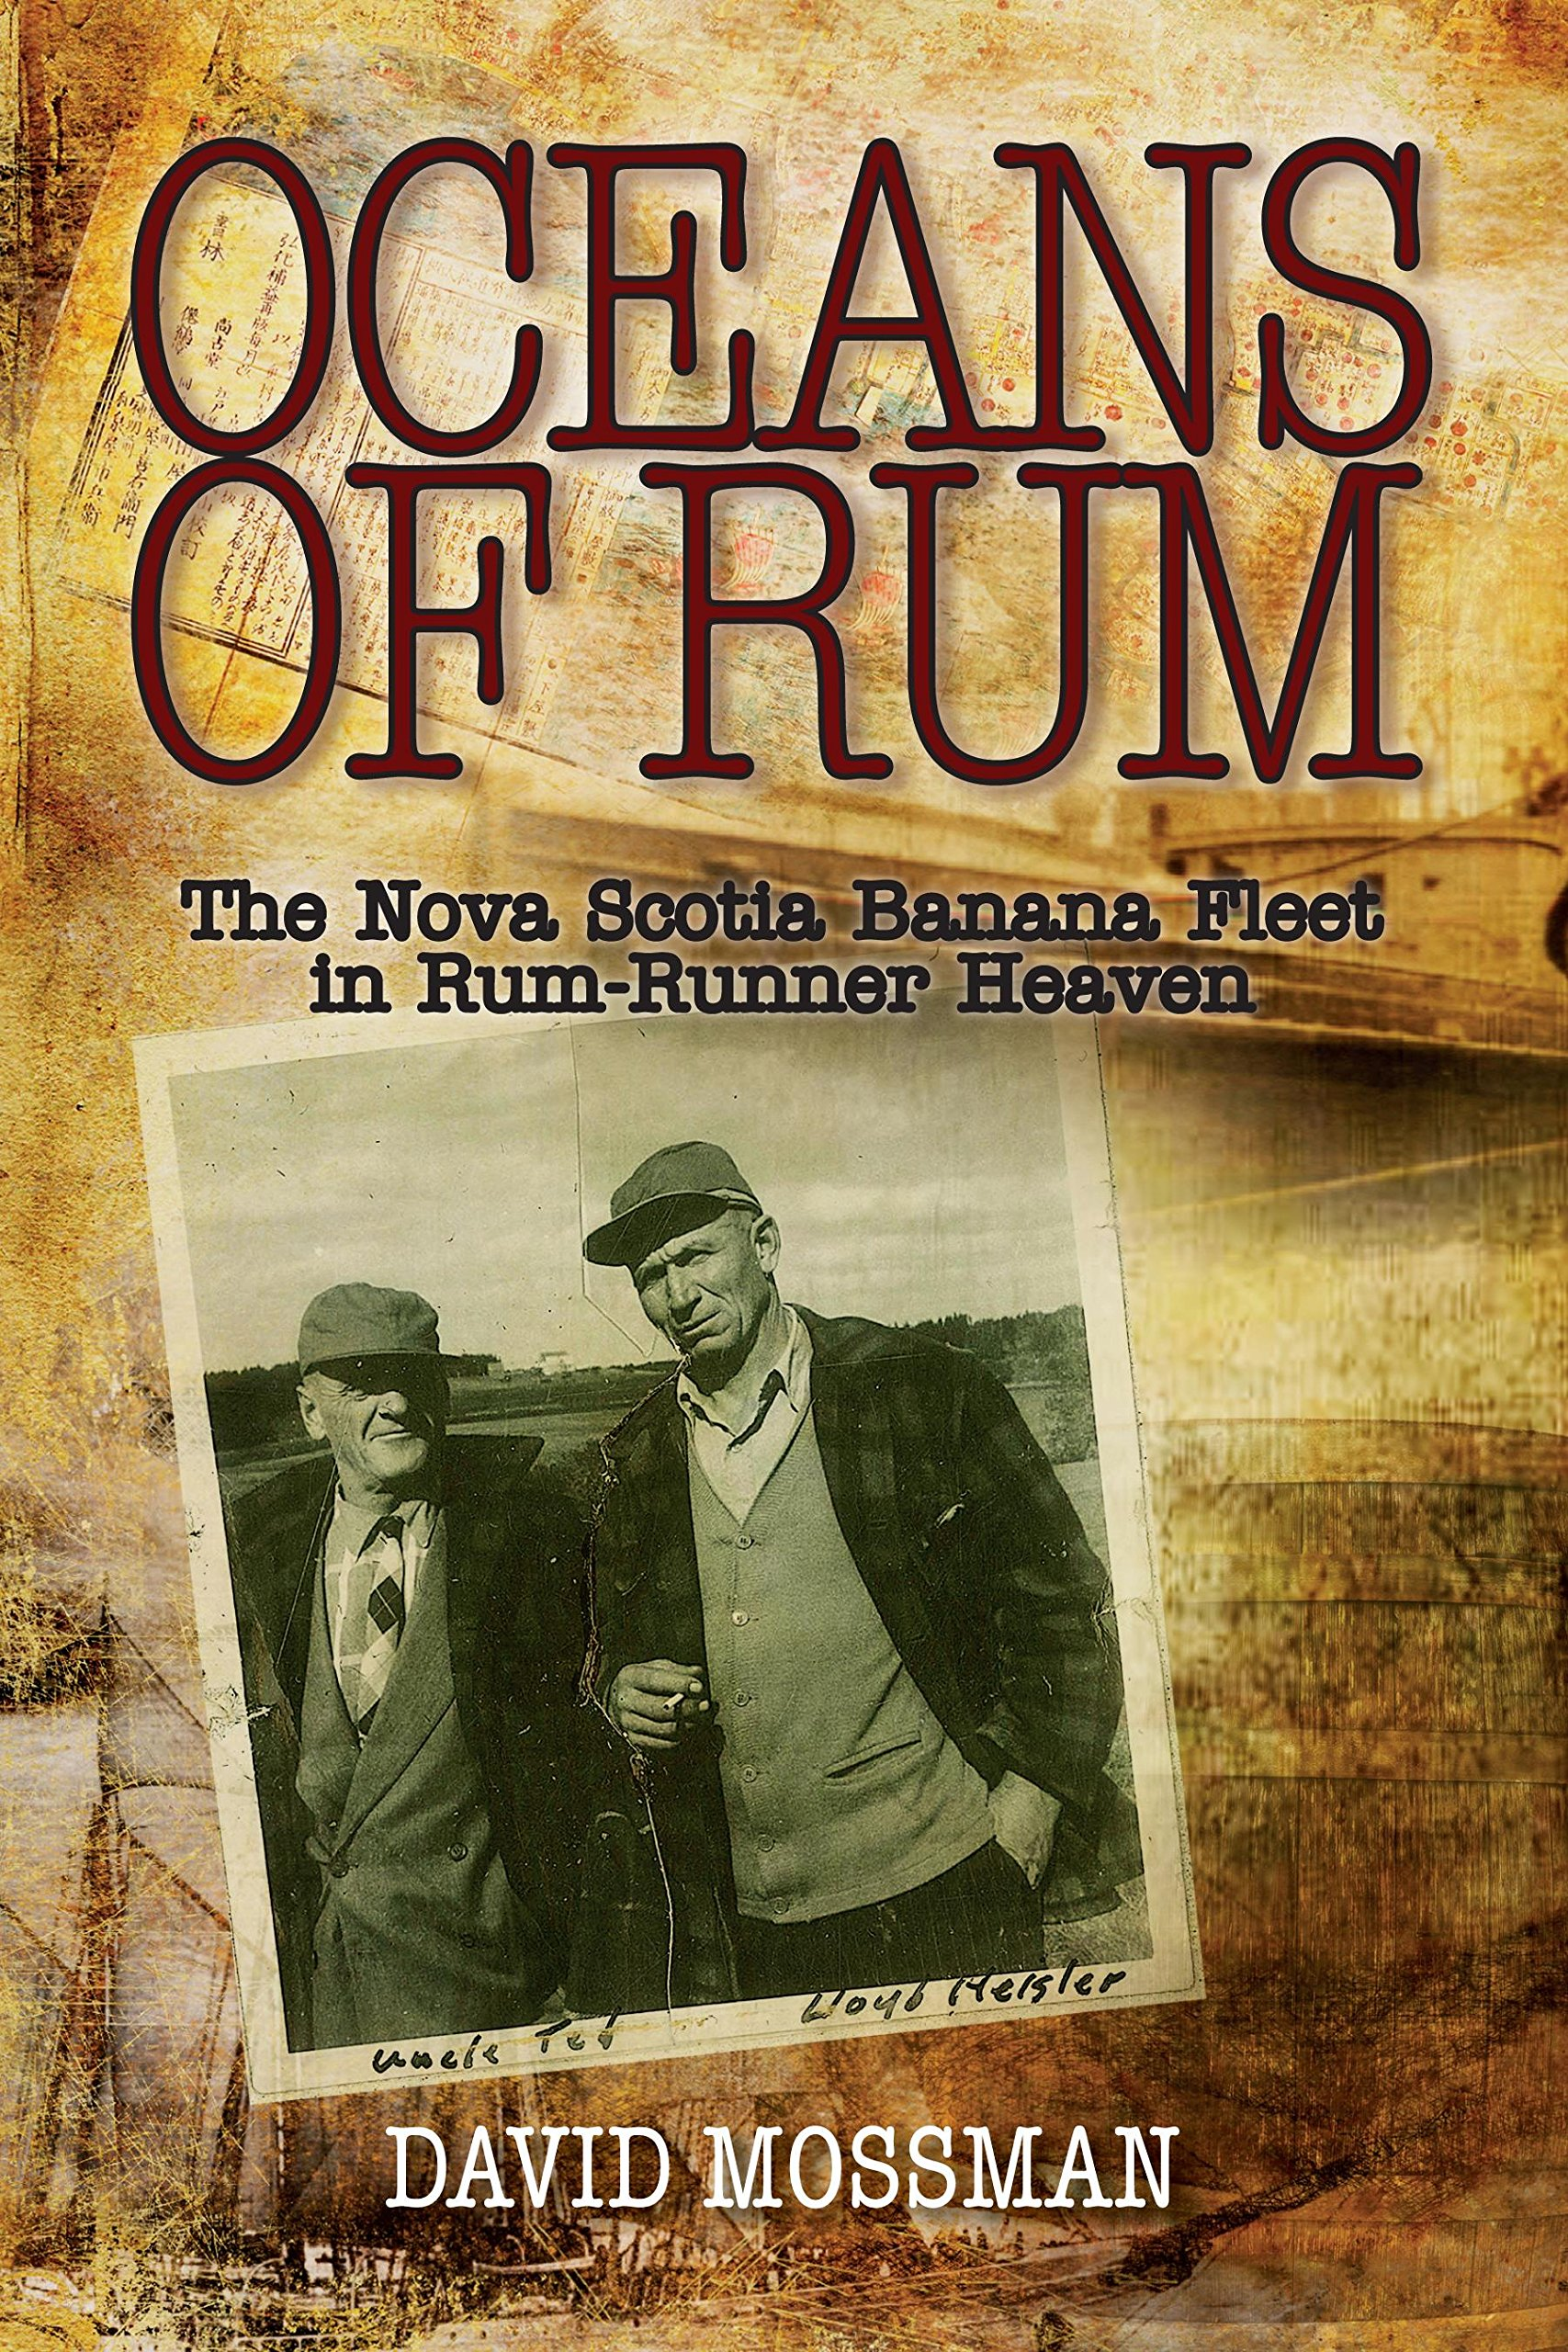 Oceans of rum the nova scotia banana fleet in rum runner heaven oceans of rum the nova scotia banana fleet in rum runner heaven david mossman 9781897426760 books amazon aiddatafo Gallery